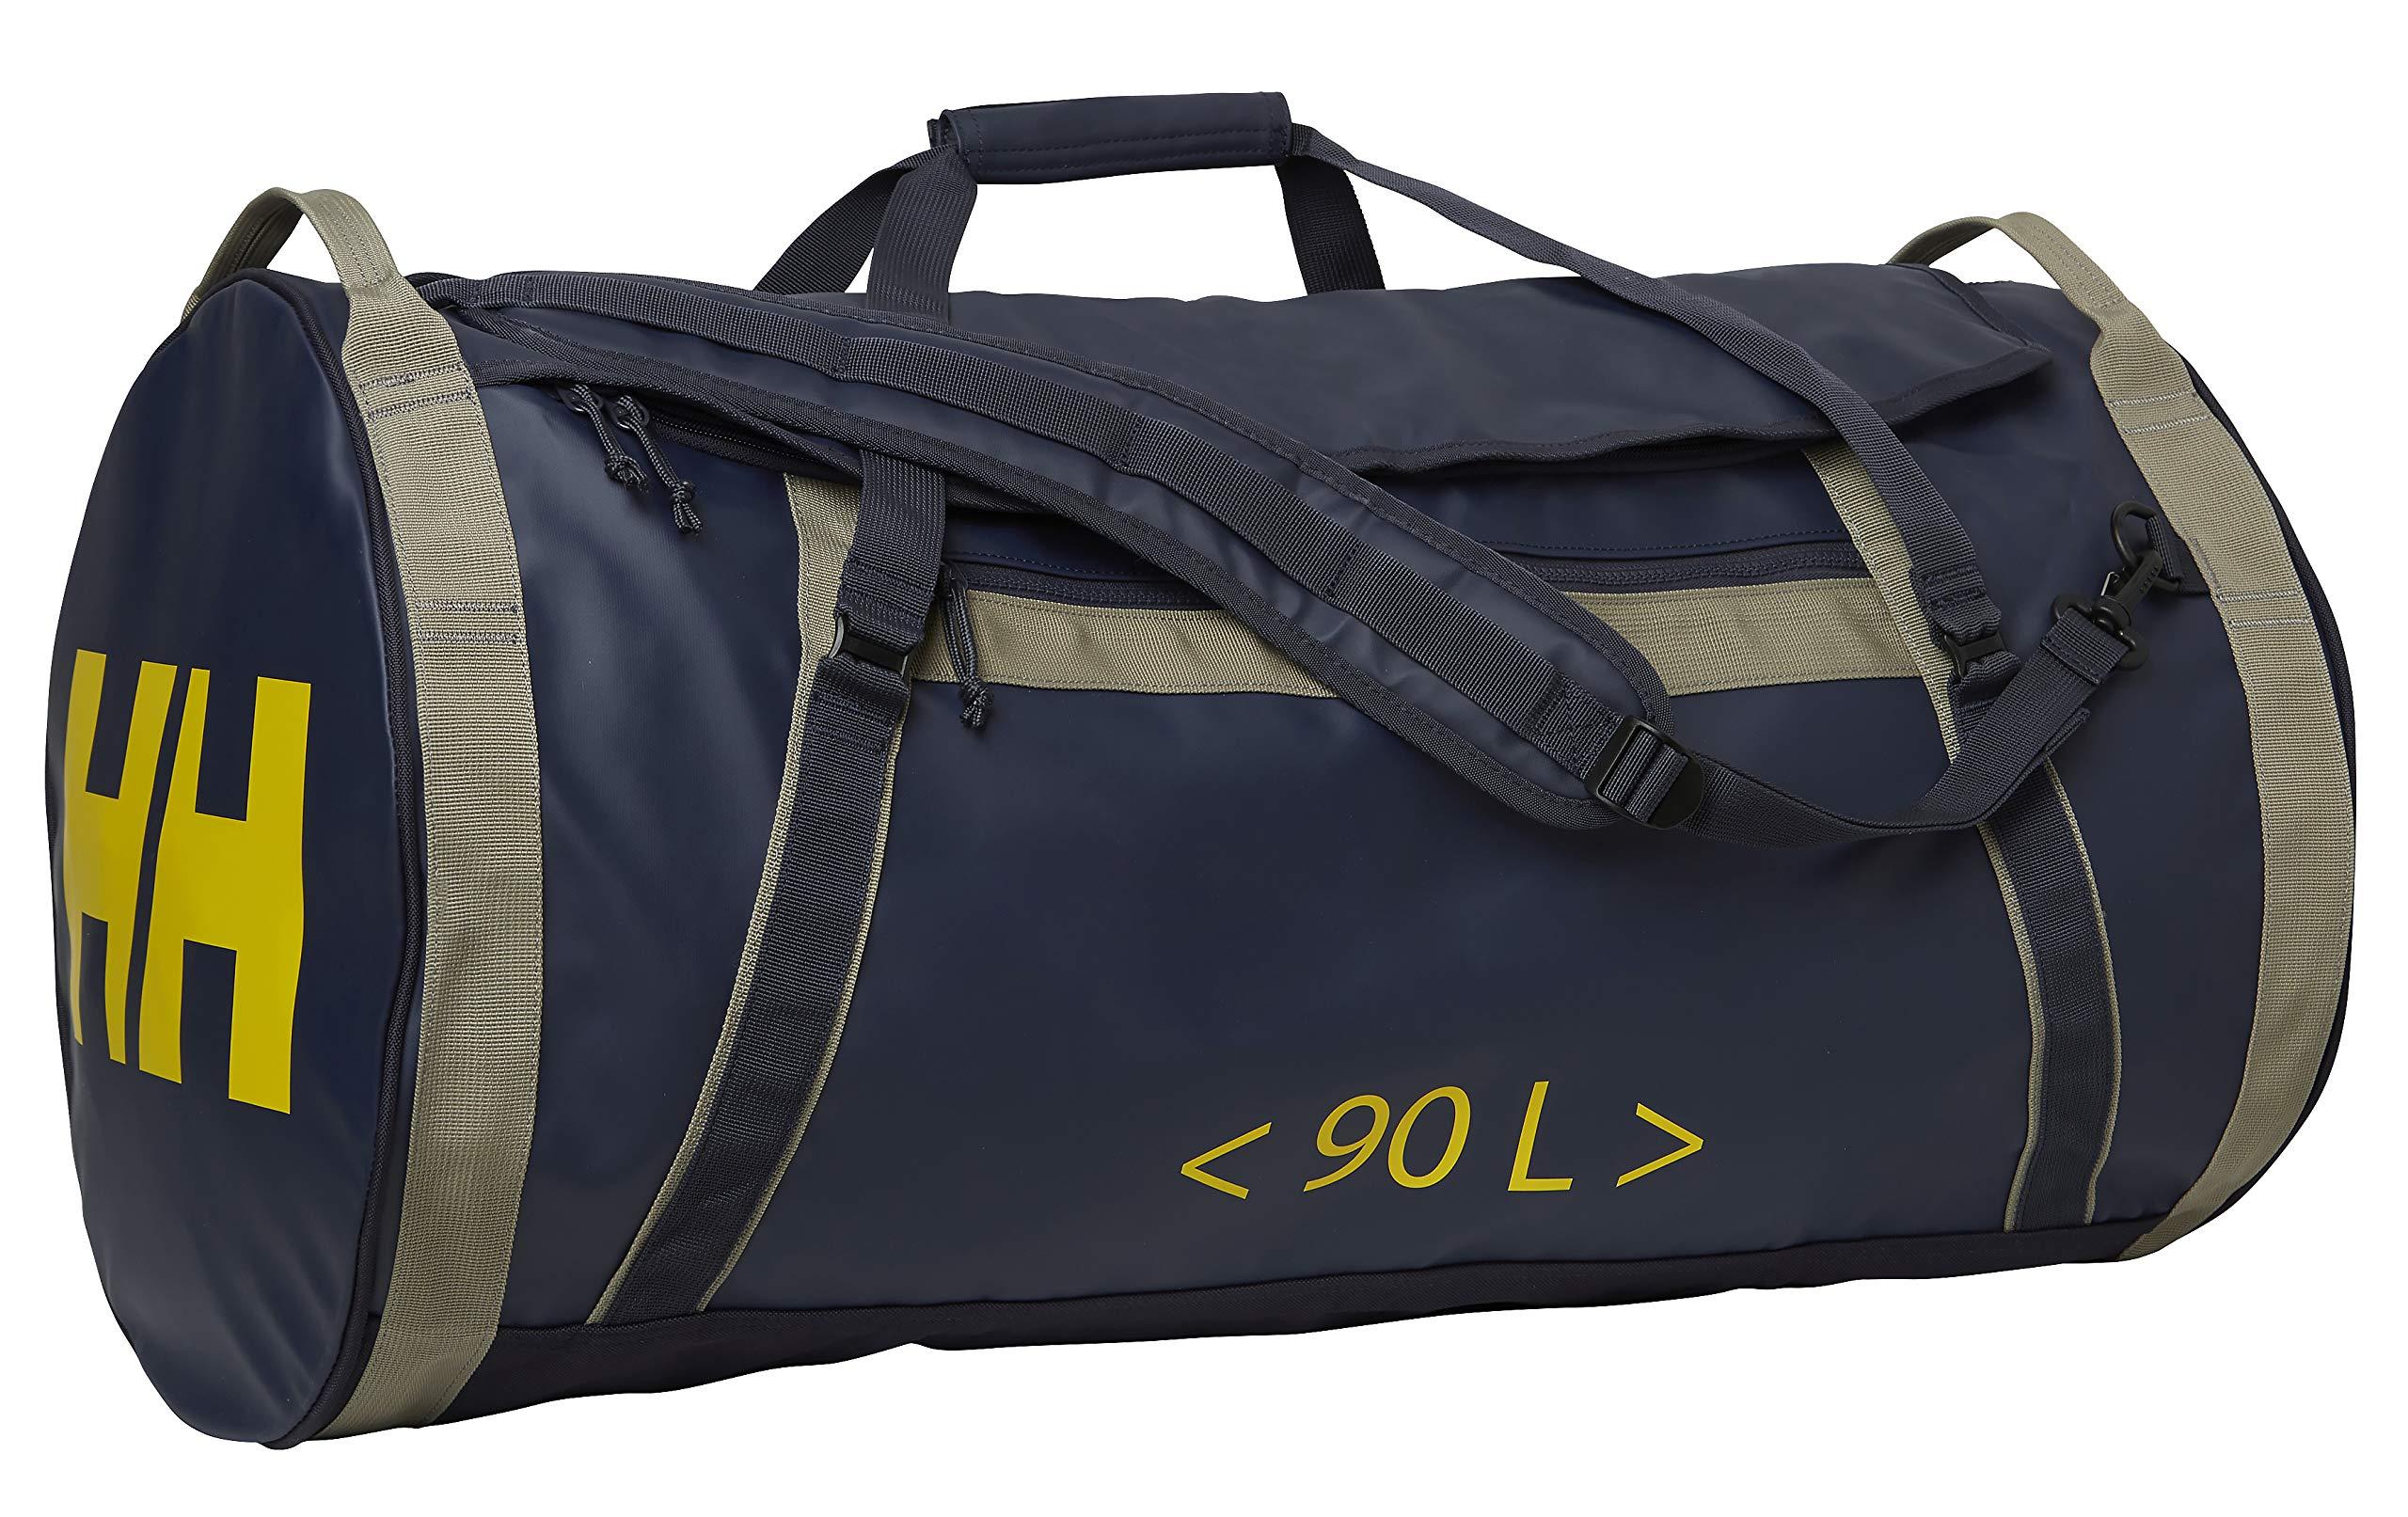 Helly Hansen Kids & Baby Hh Duffel Bag 2 90l, Graphite Blue, Standard